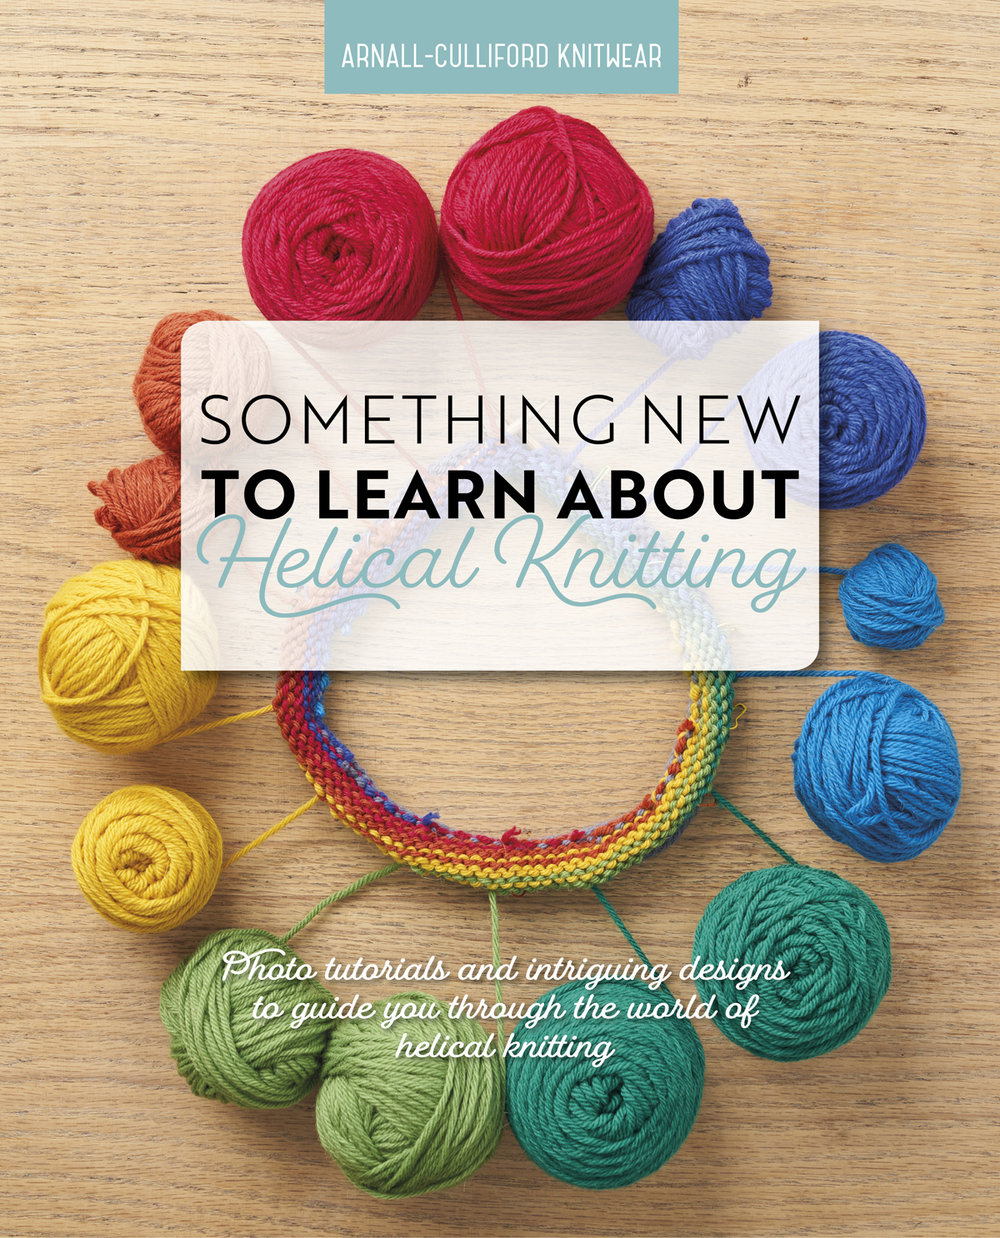 SN2LA Helical Knitting cover image_lr.jpg